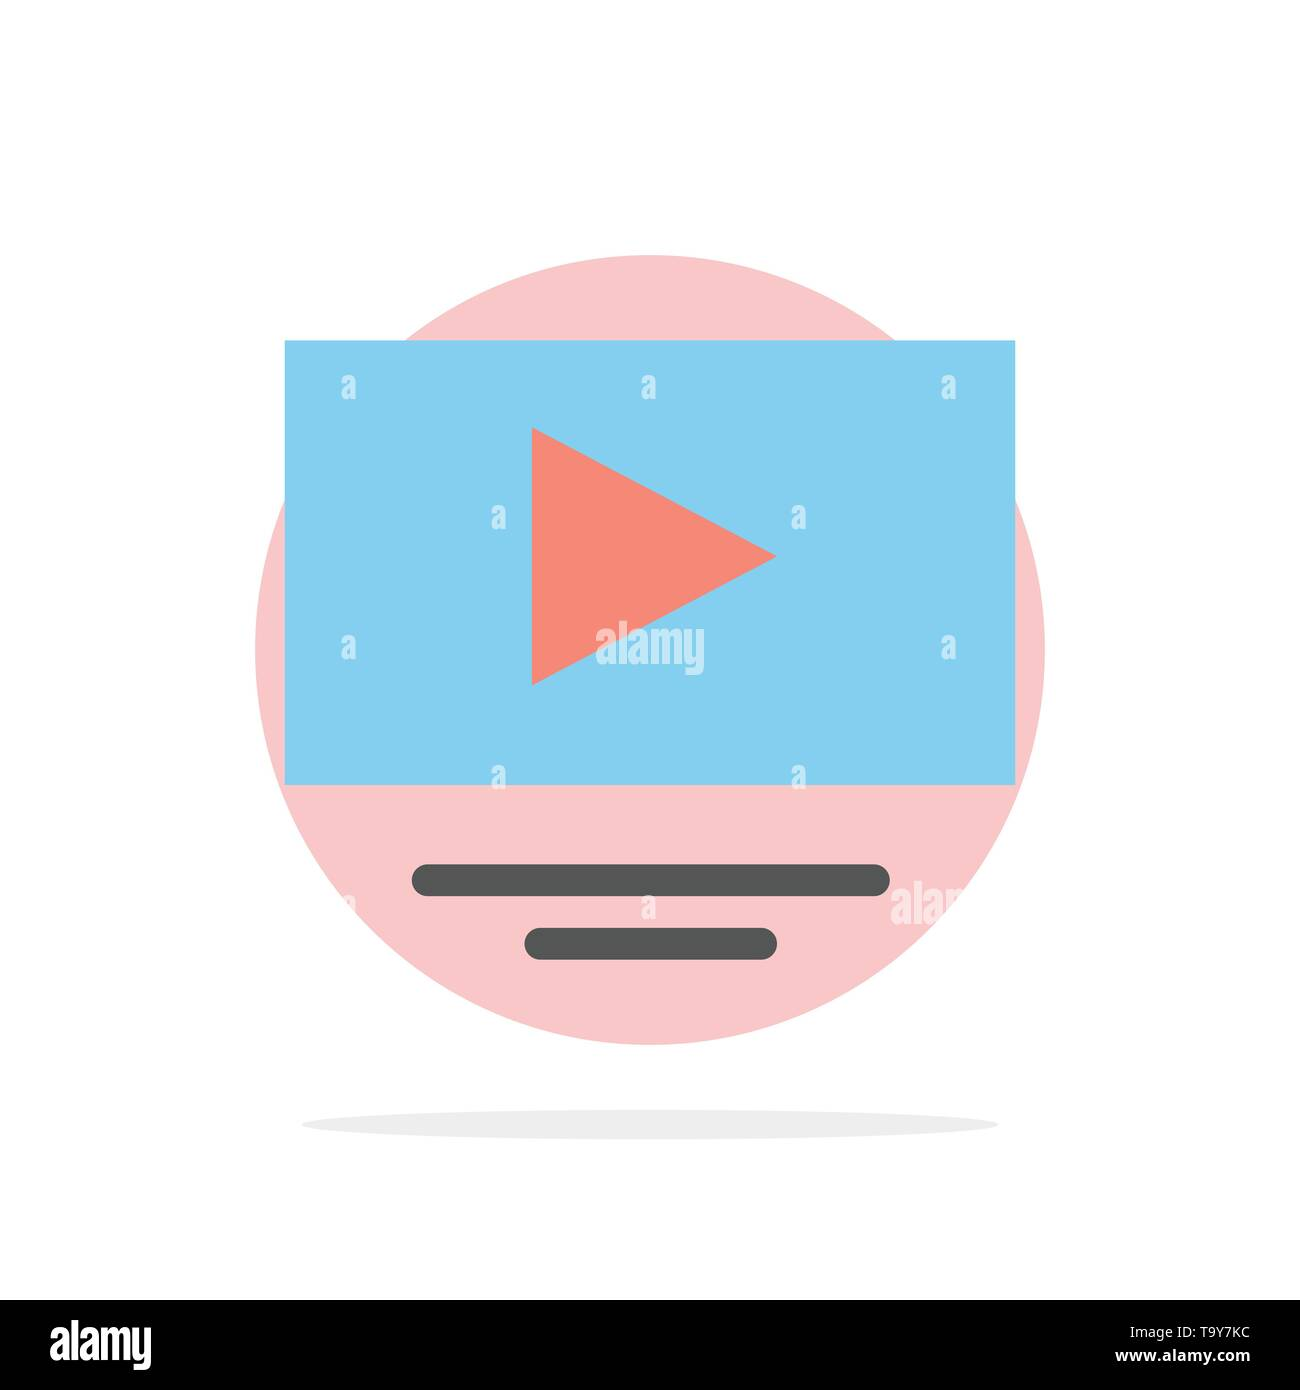 Youtube Art Leinwandkunst Gemalde Auf Leinwand Und Acryl Abstrakt